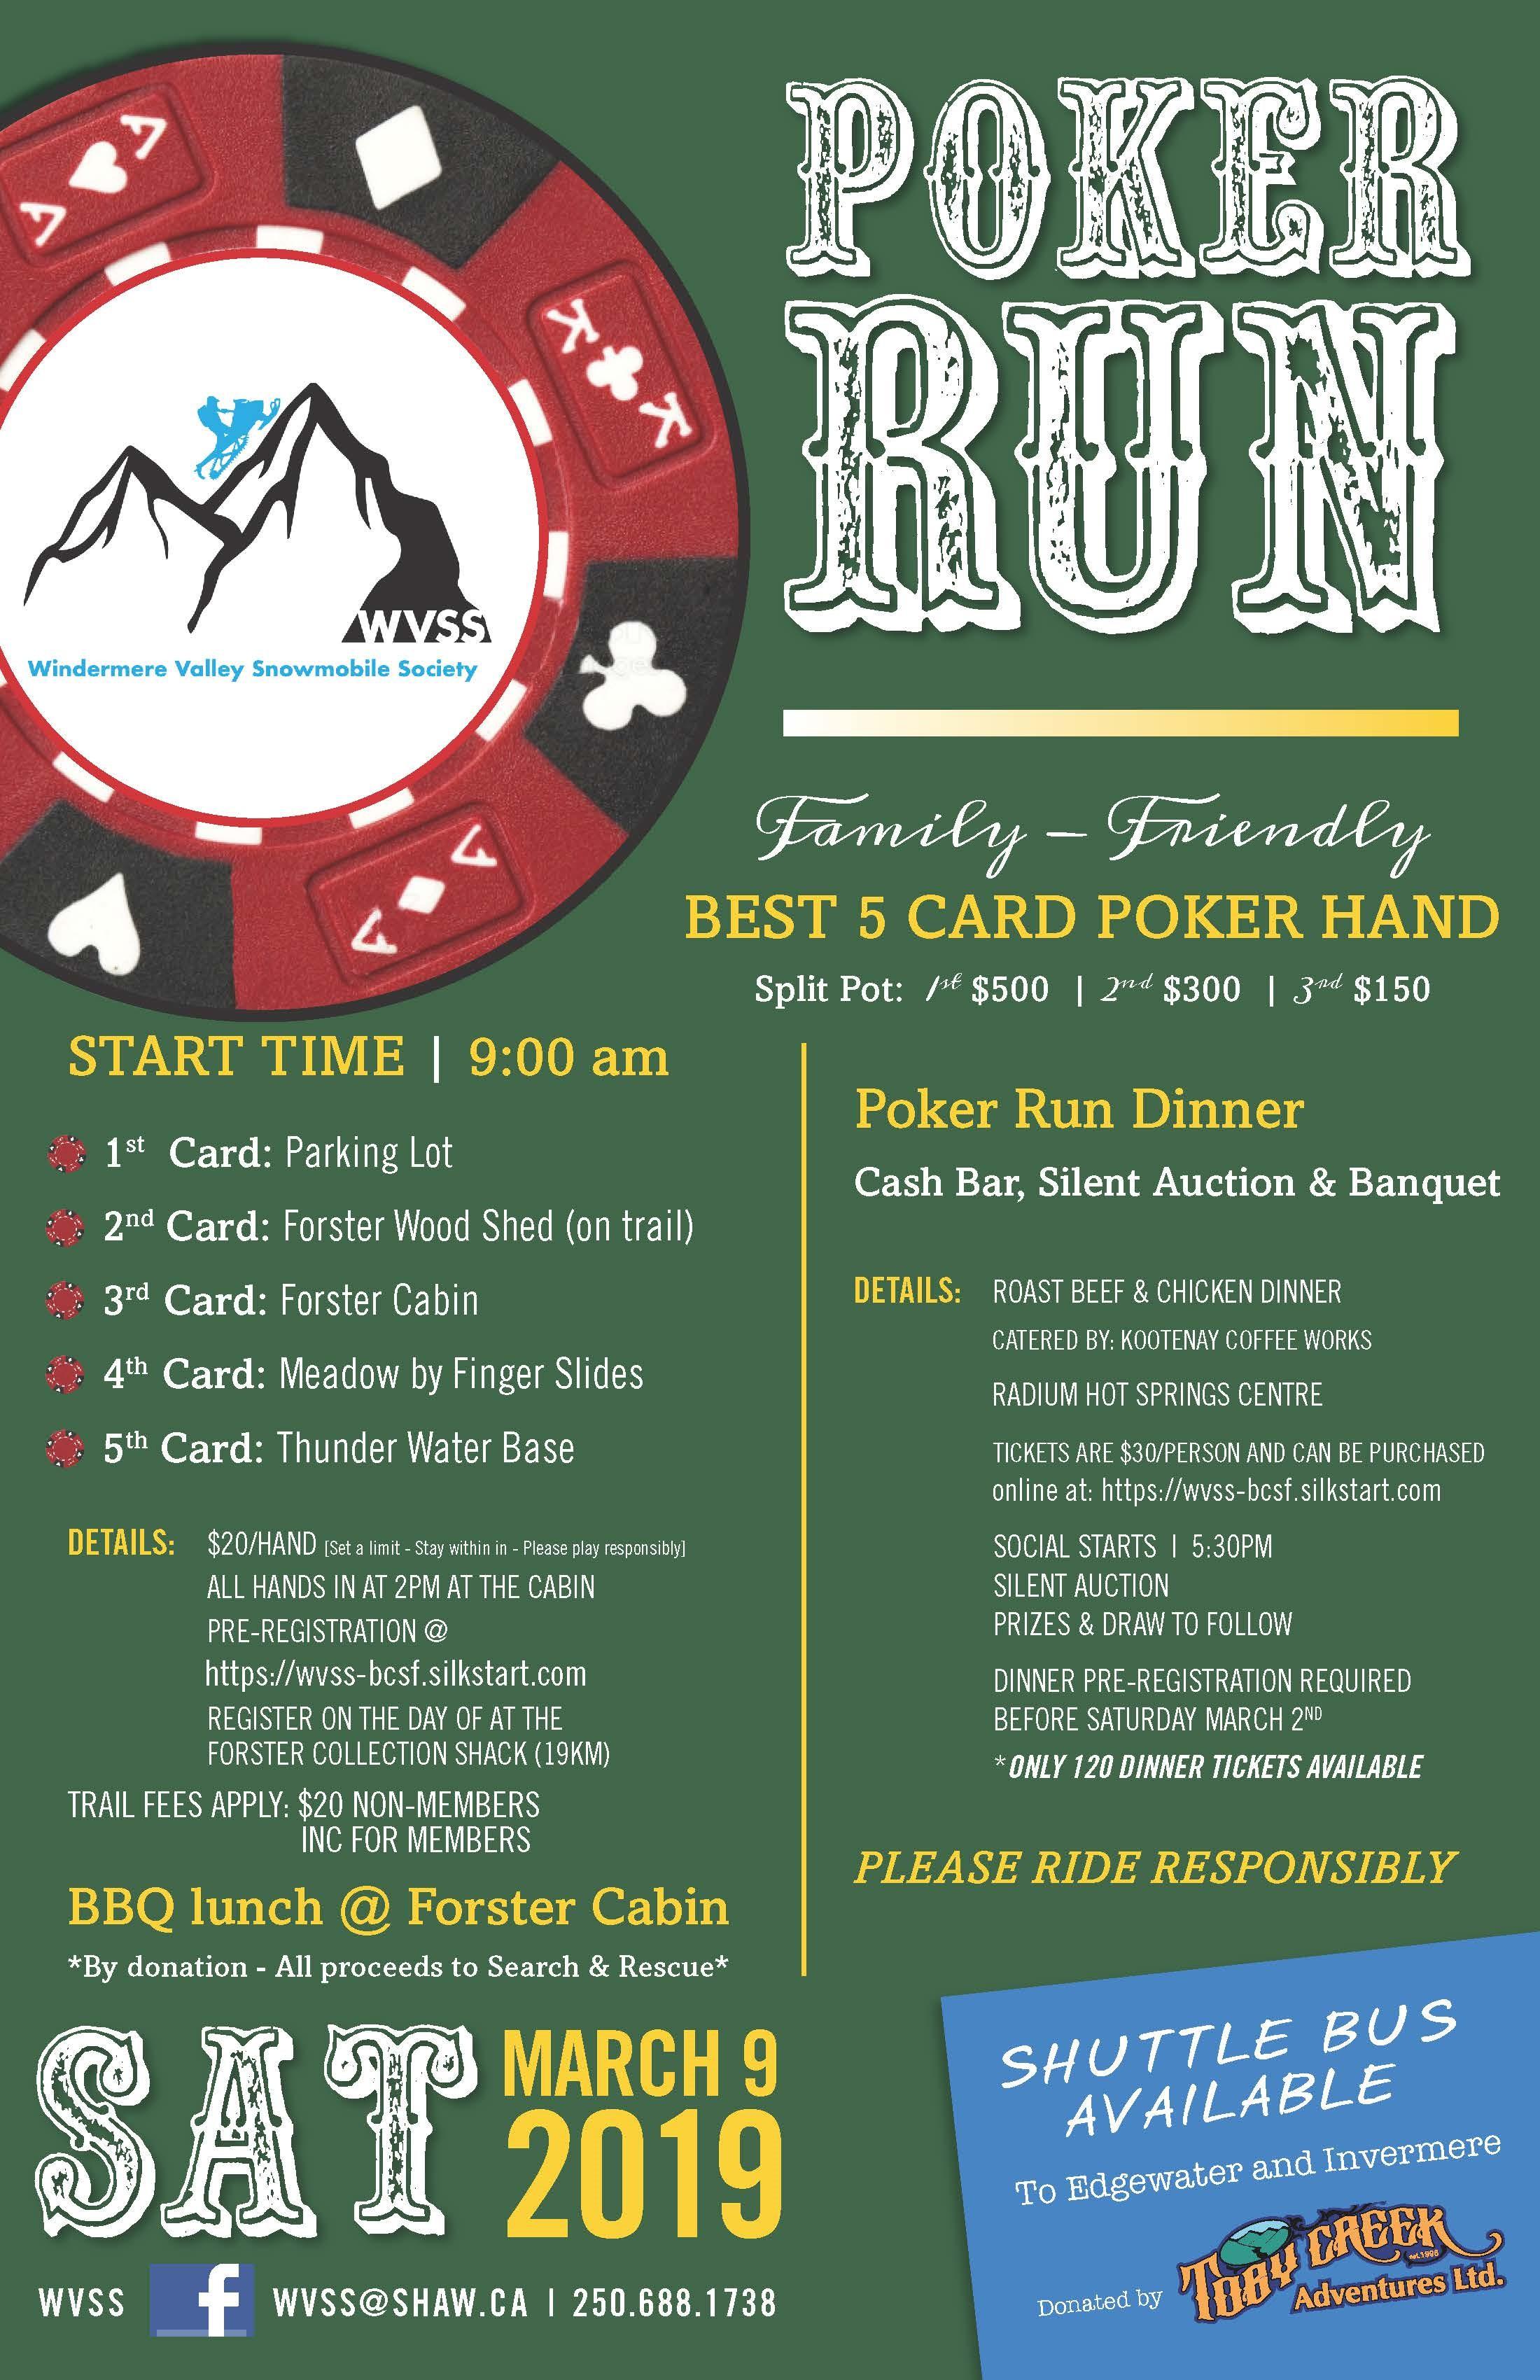 WVSS Family Friendly Poker Run - Radium Hot Springs